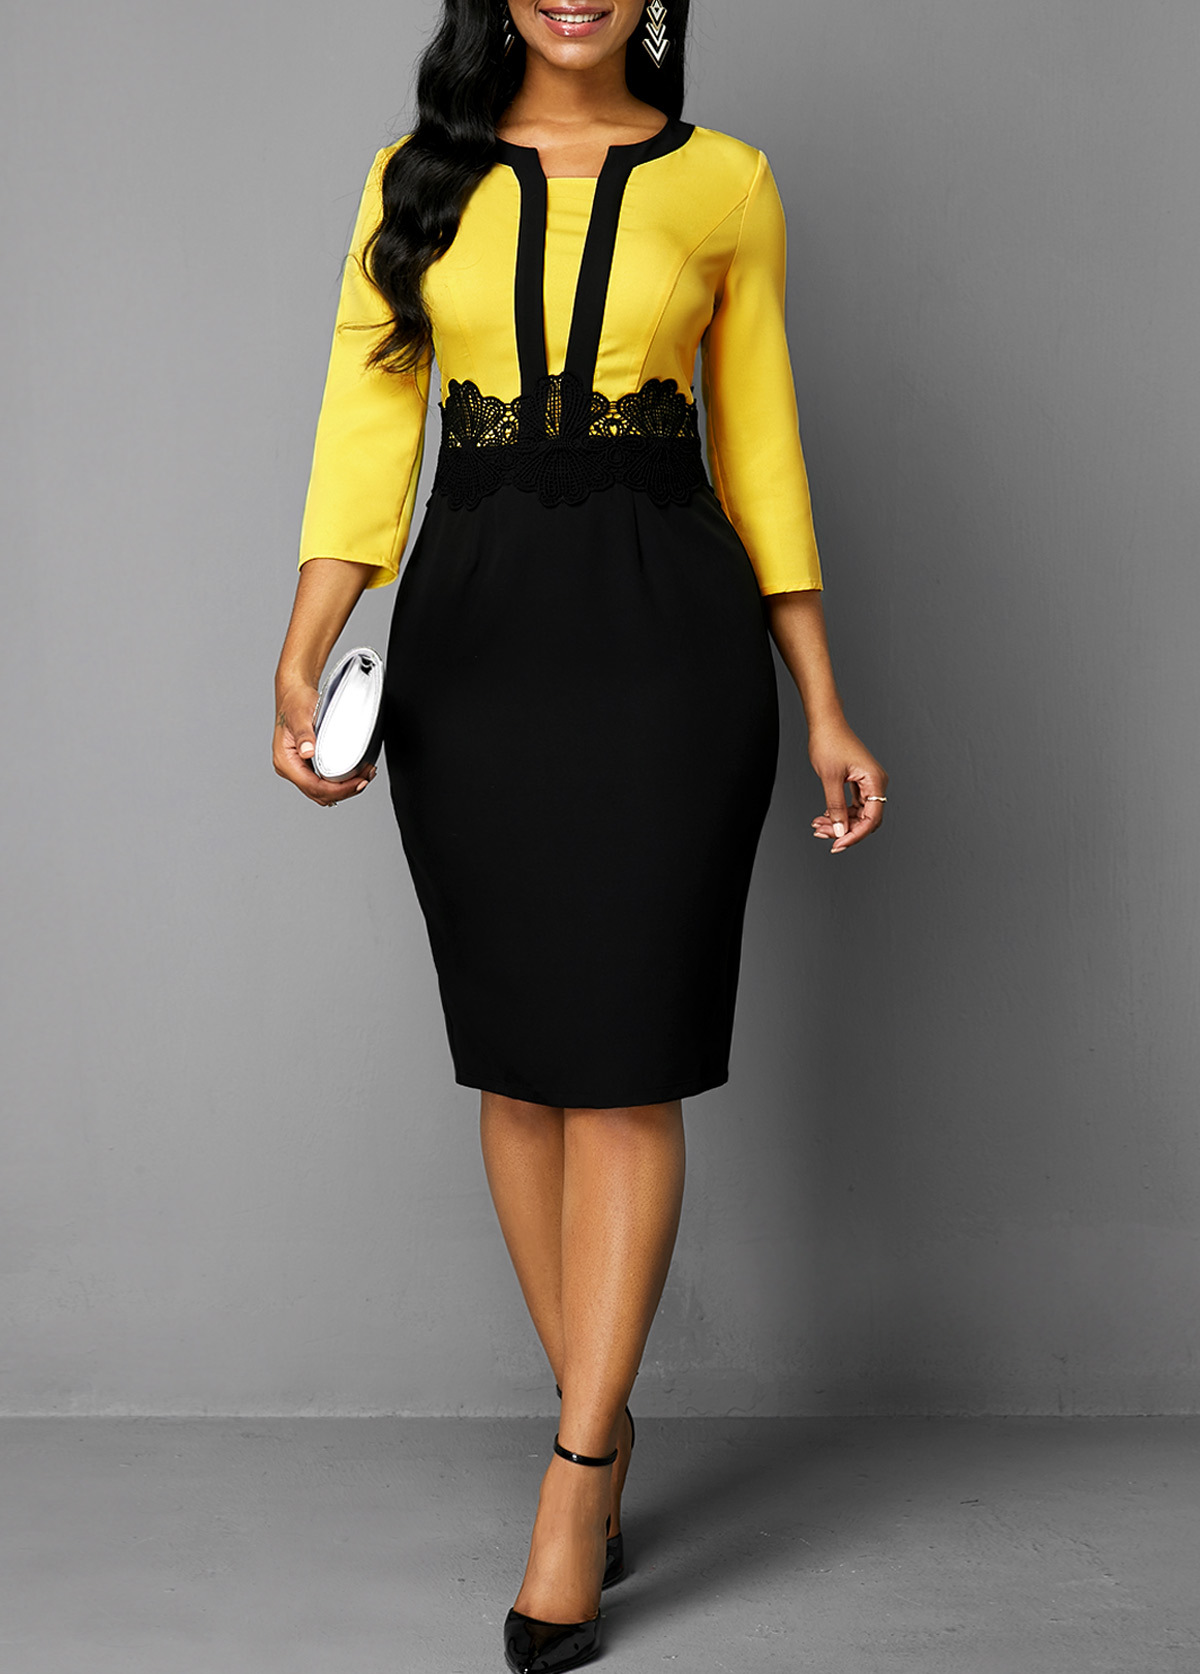 Plus Size Women 2019 Autumn Retro Yellow Stitching Large Size Dress Ladies Round Neck Casual 3/4 Sleeve Slim Bag Hip Step Dress